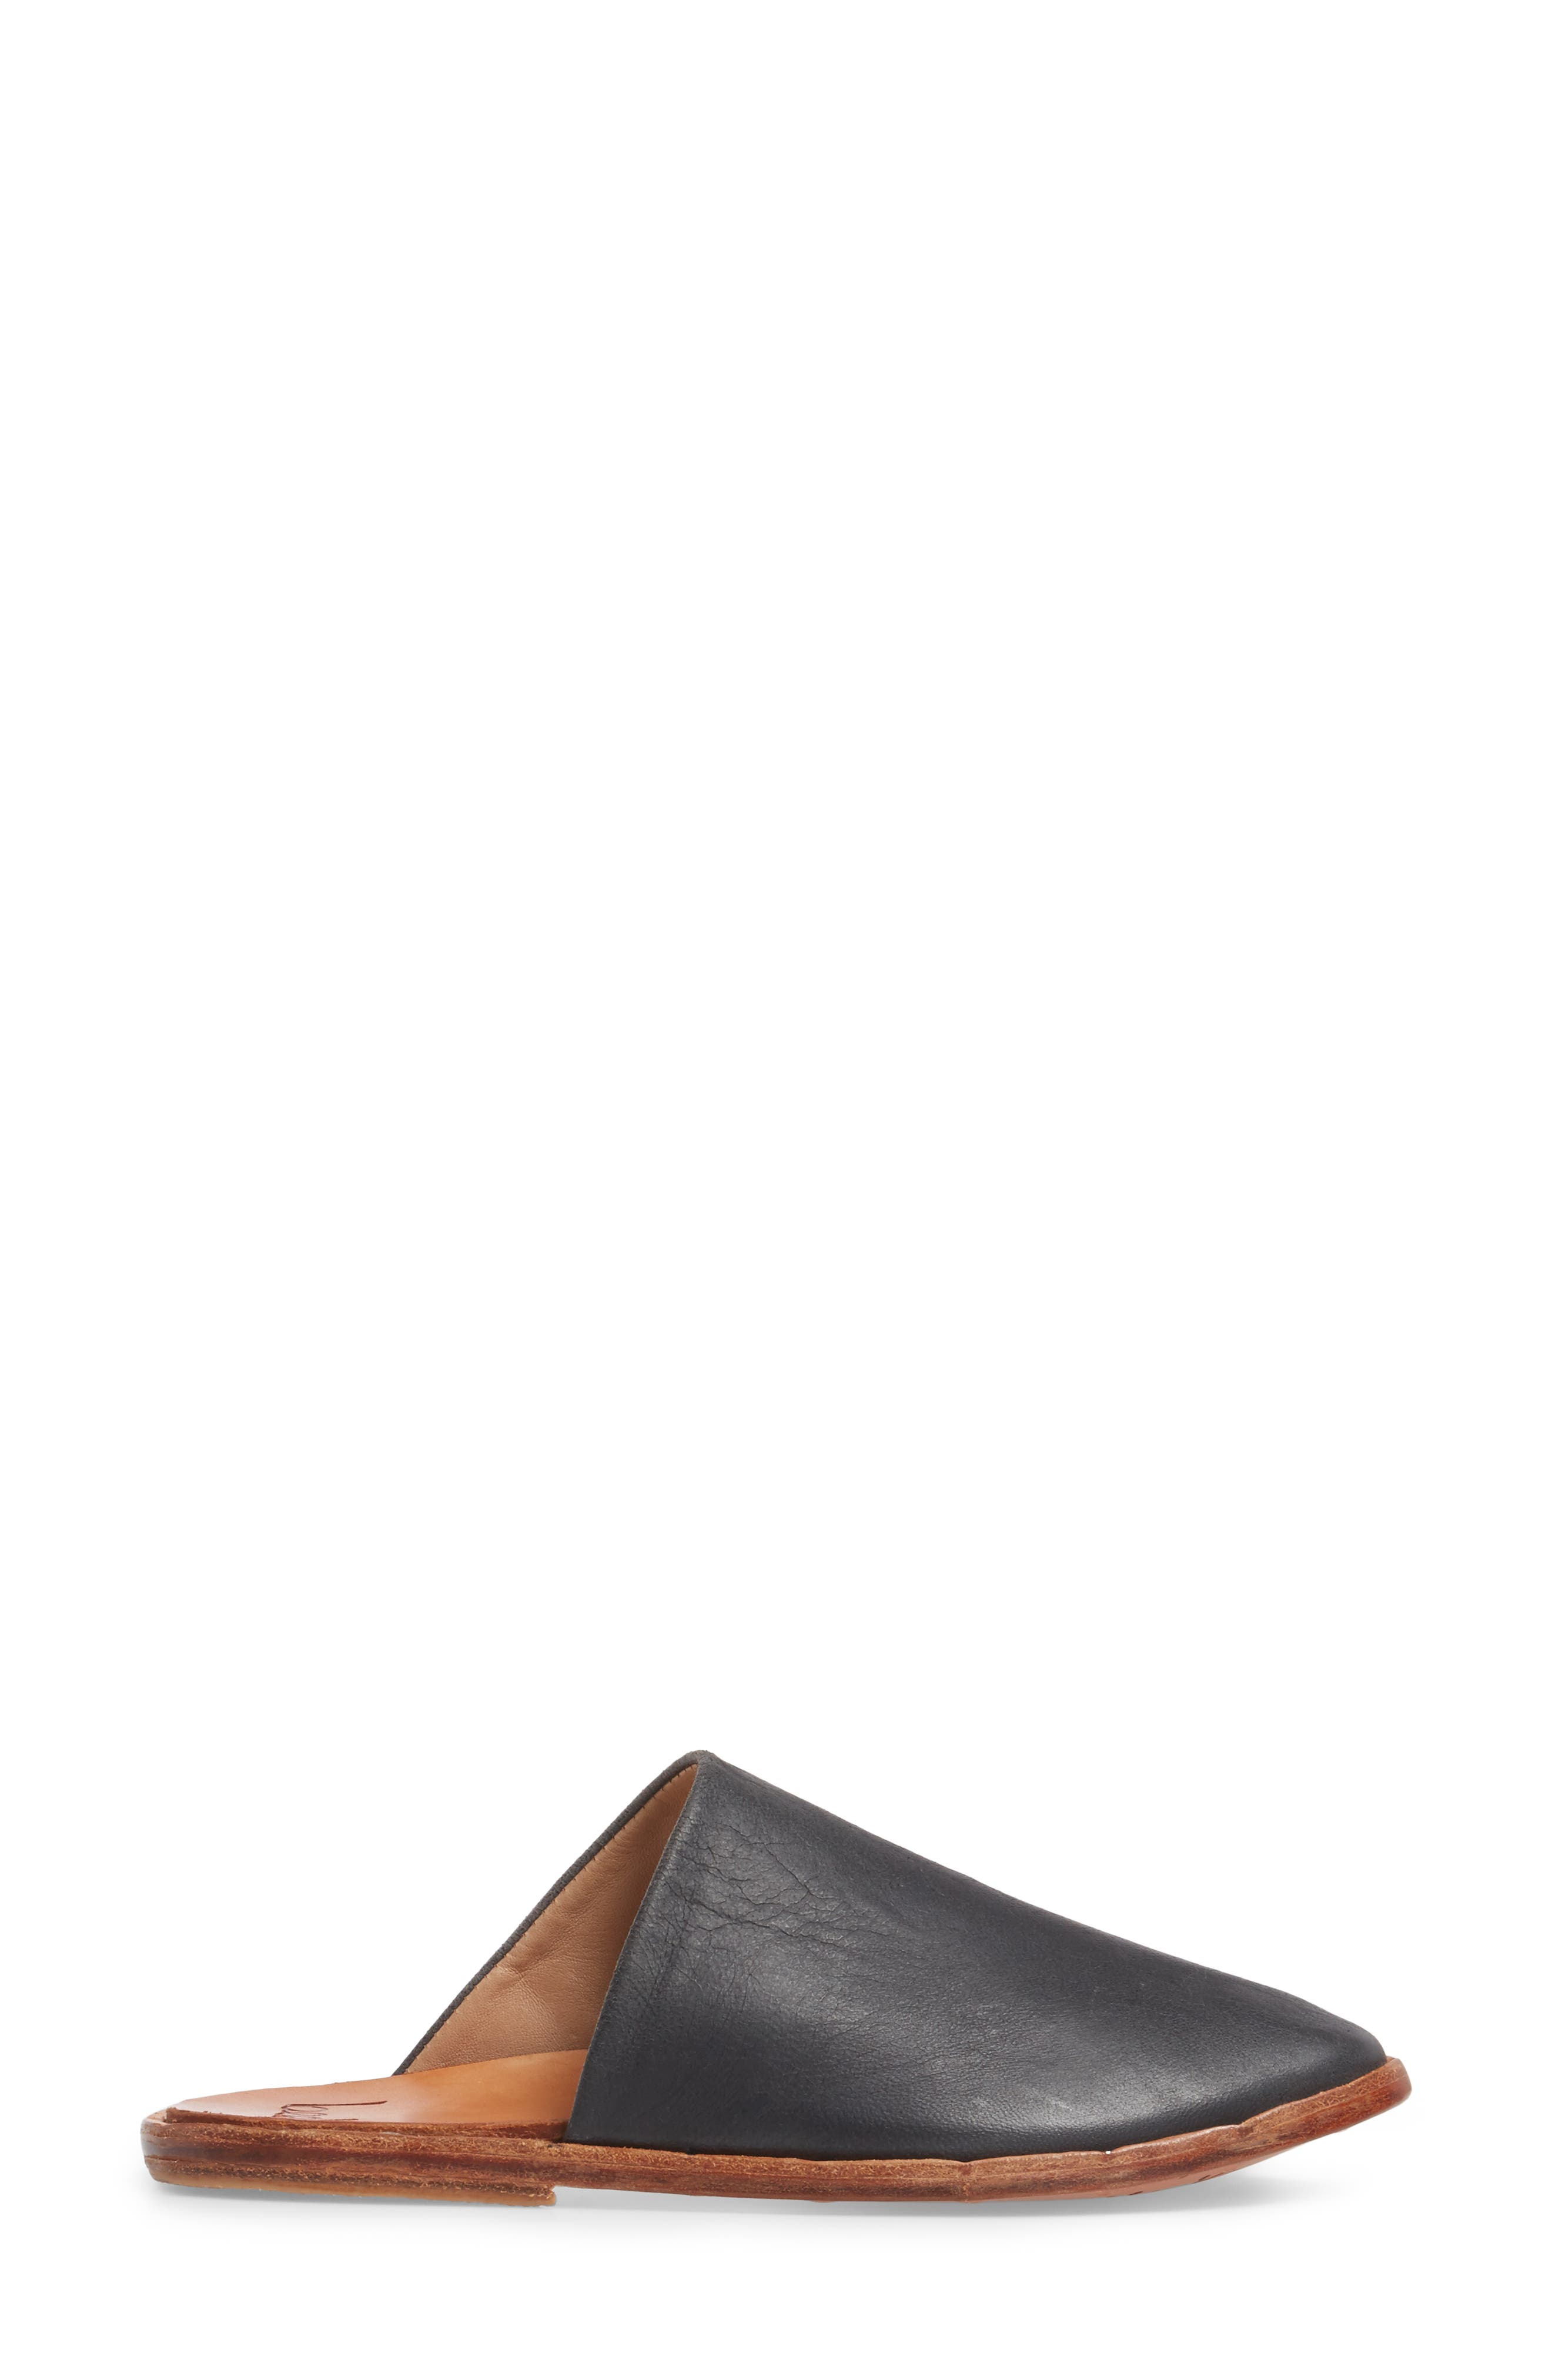 Seagull Mule,                             Alternate thumbnail 3, color,                             Vintage Black Leather